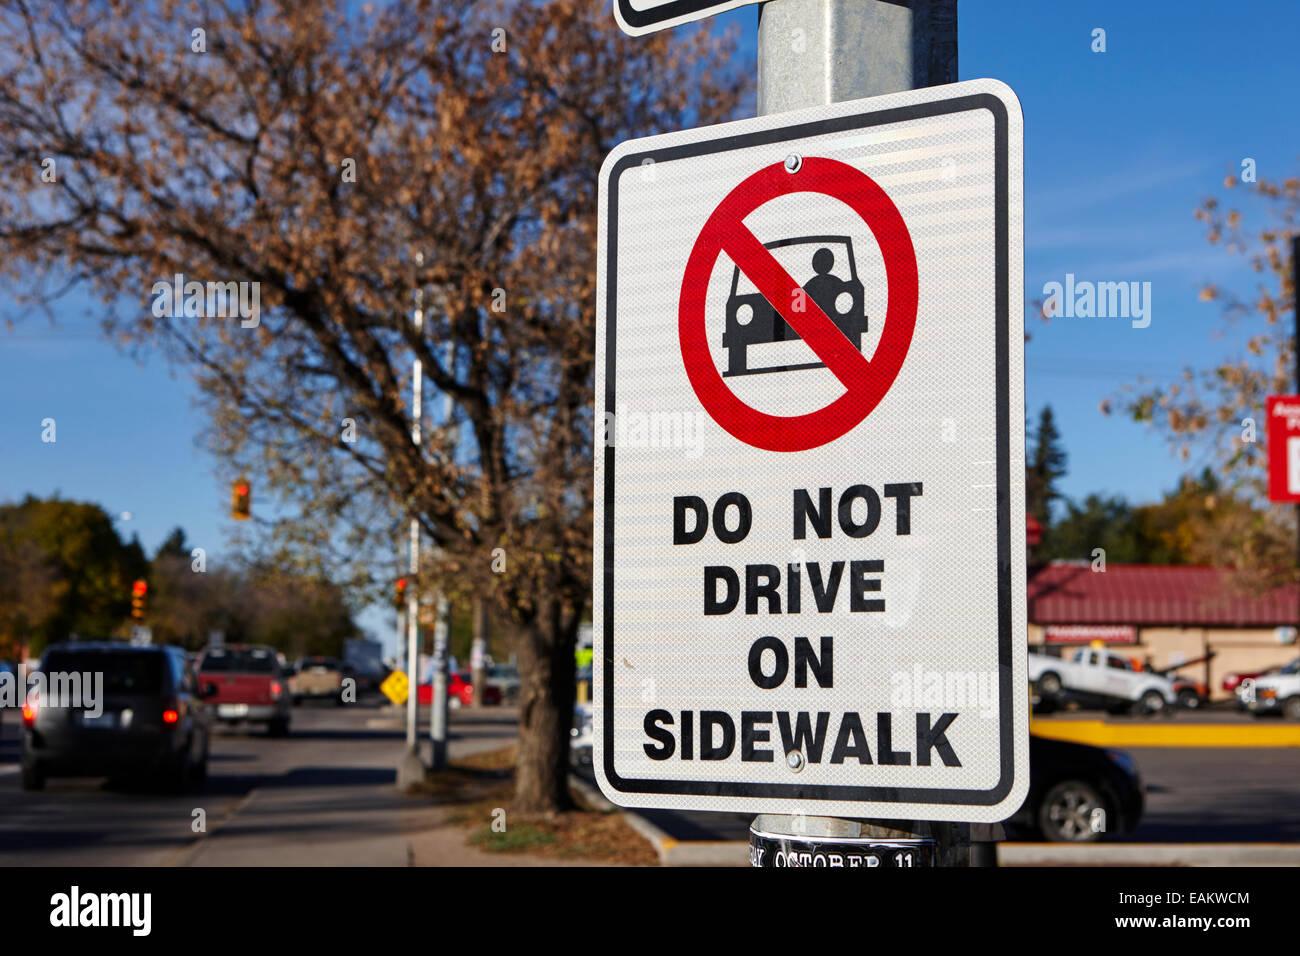 do not drive on sidewalk sign saskatoon Saskatchewan Canada - Stock Image